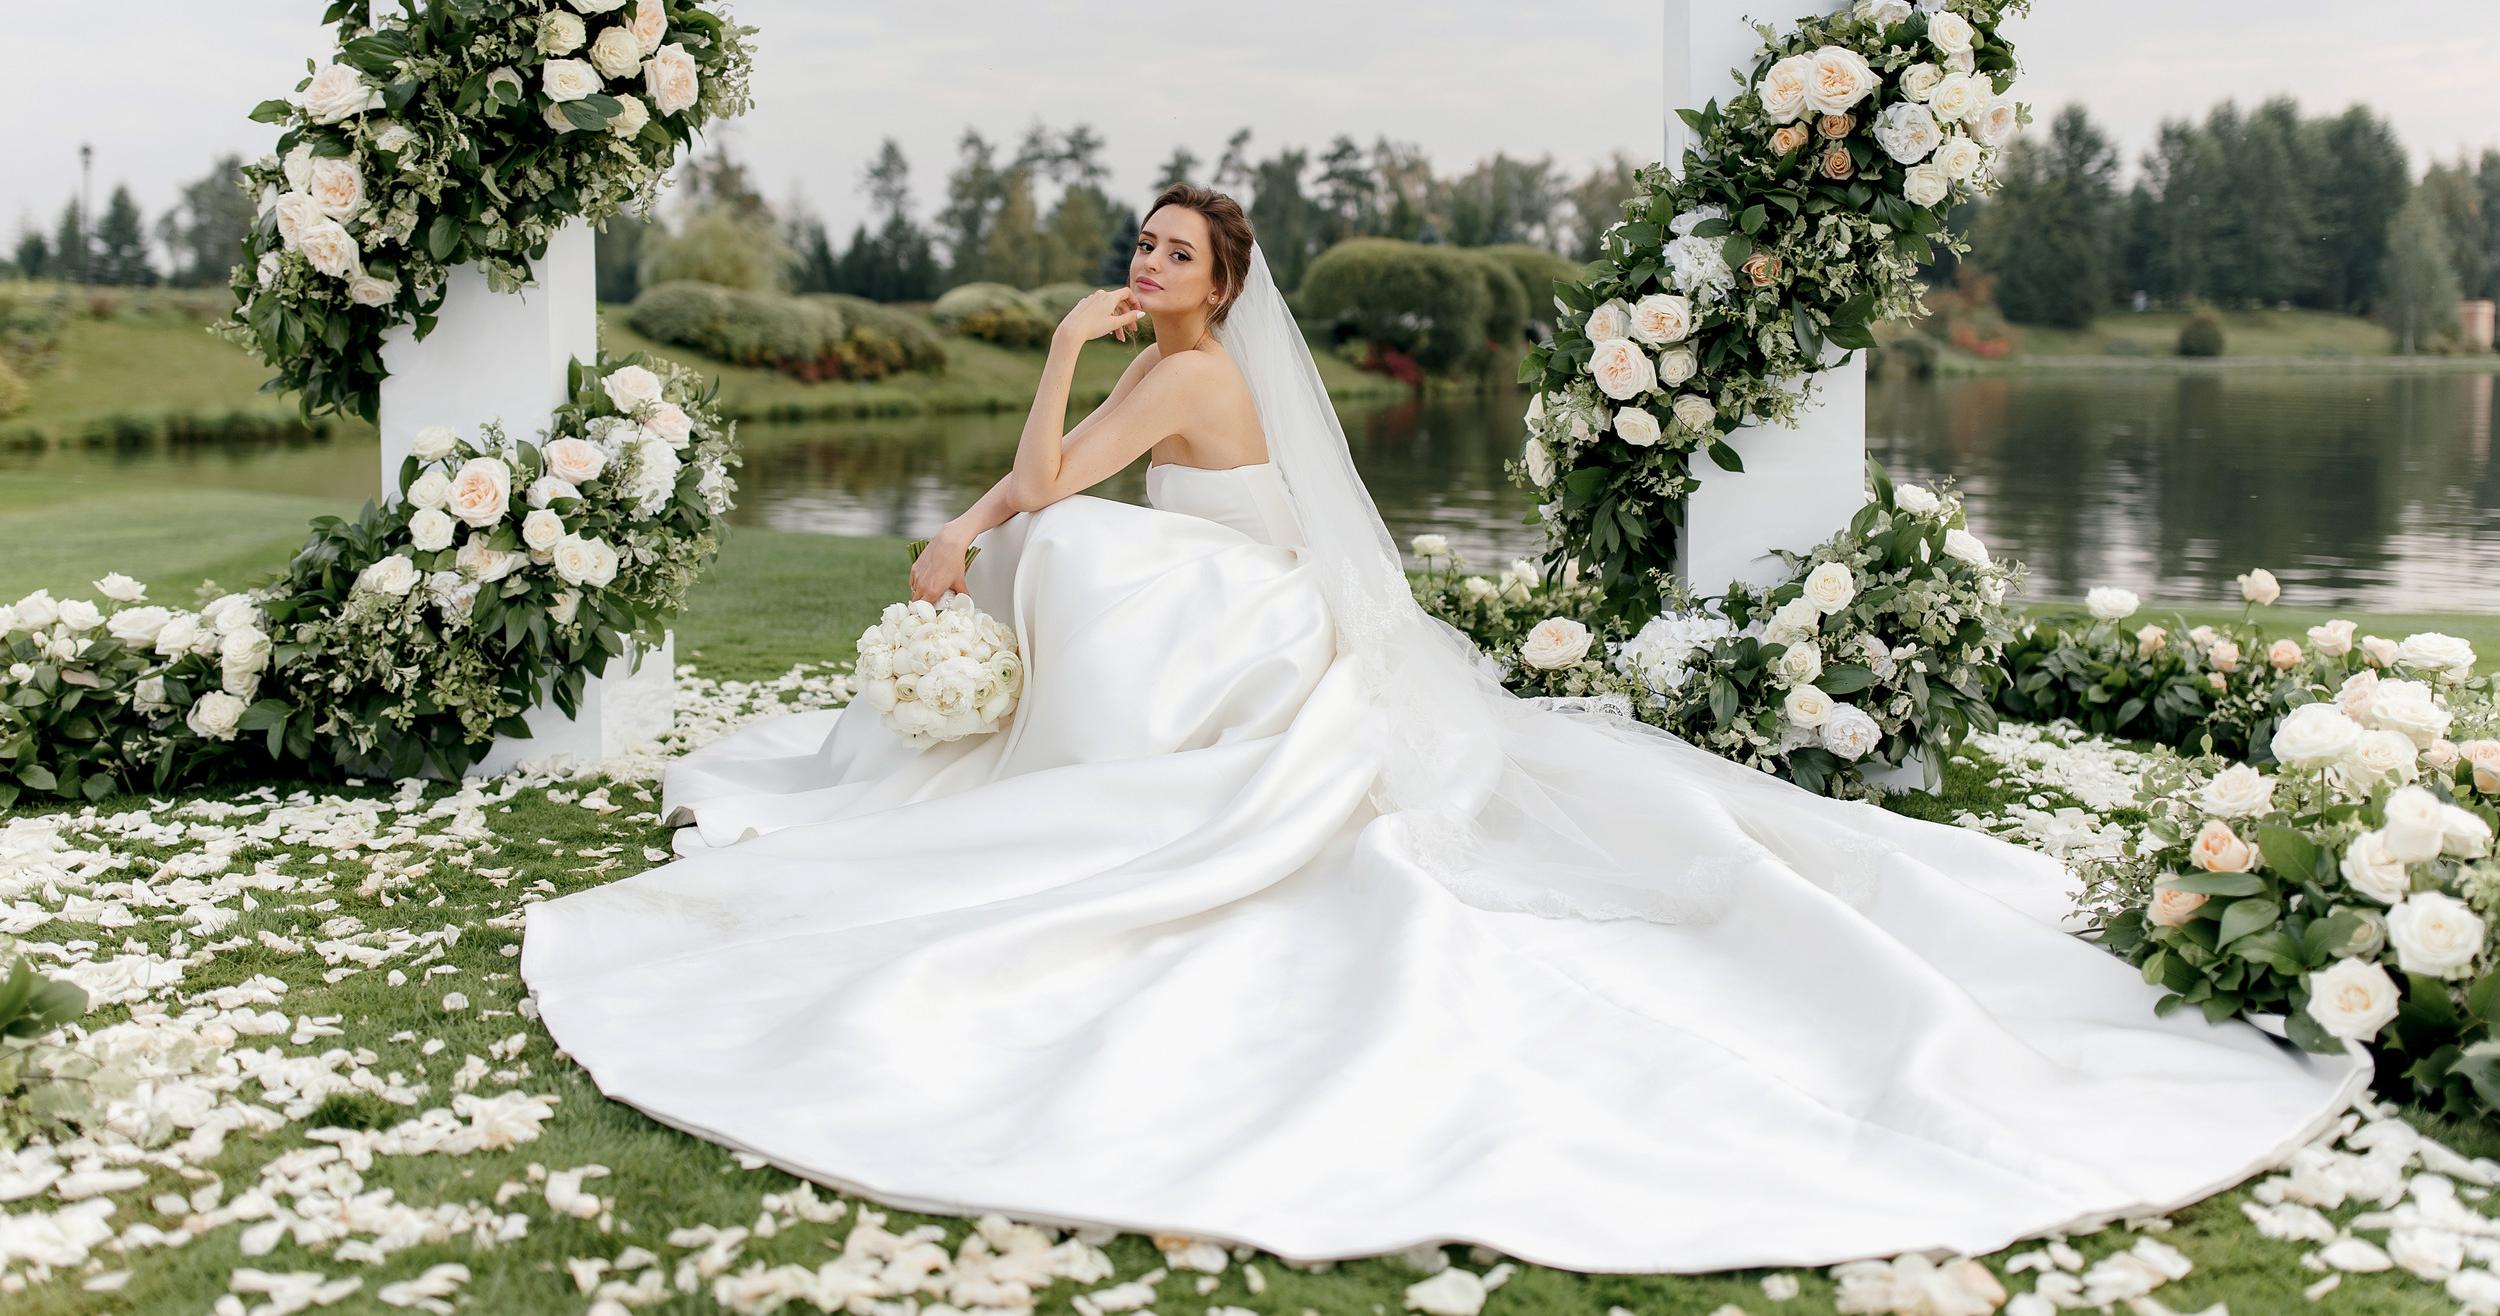 Сказочная свадьба от агентства SvadBerry